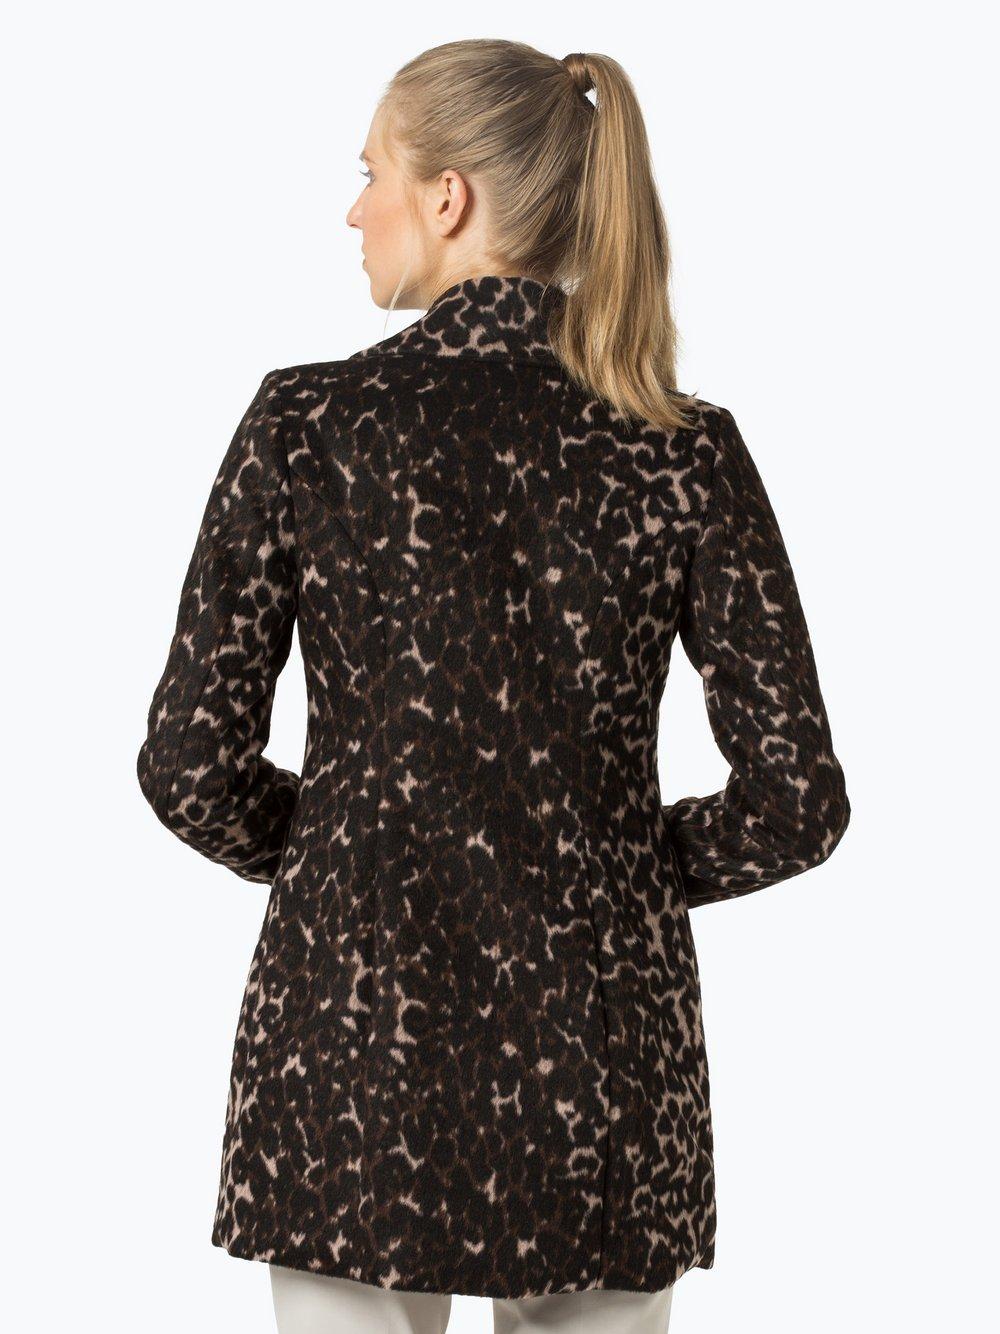 Guess Jeans Damen Mantel online kaufen | VANGRAAF.COM